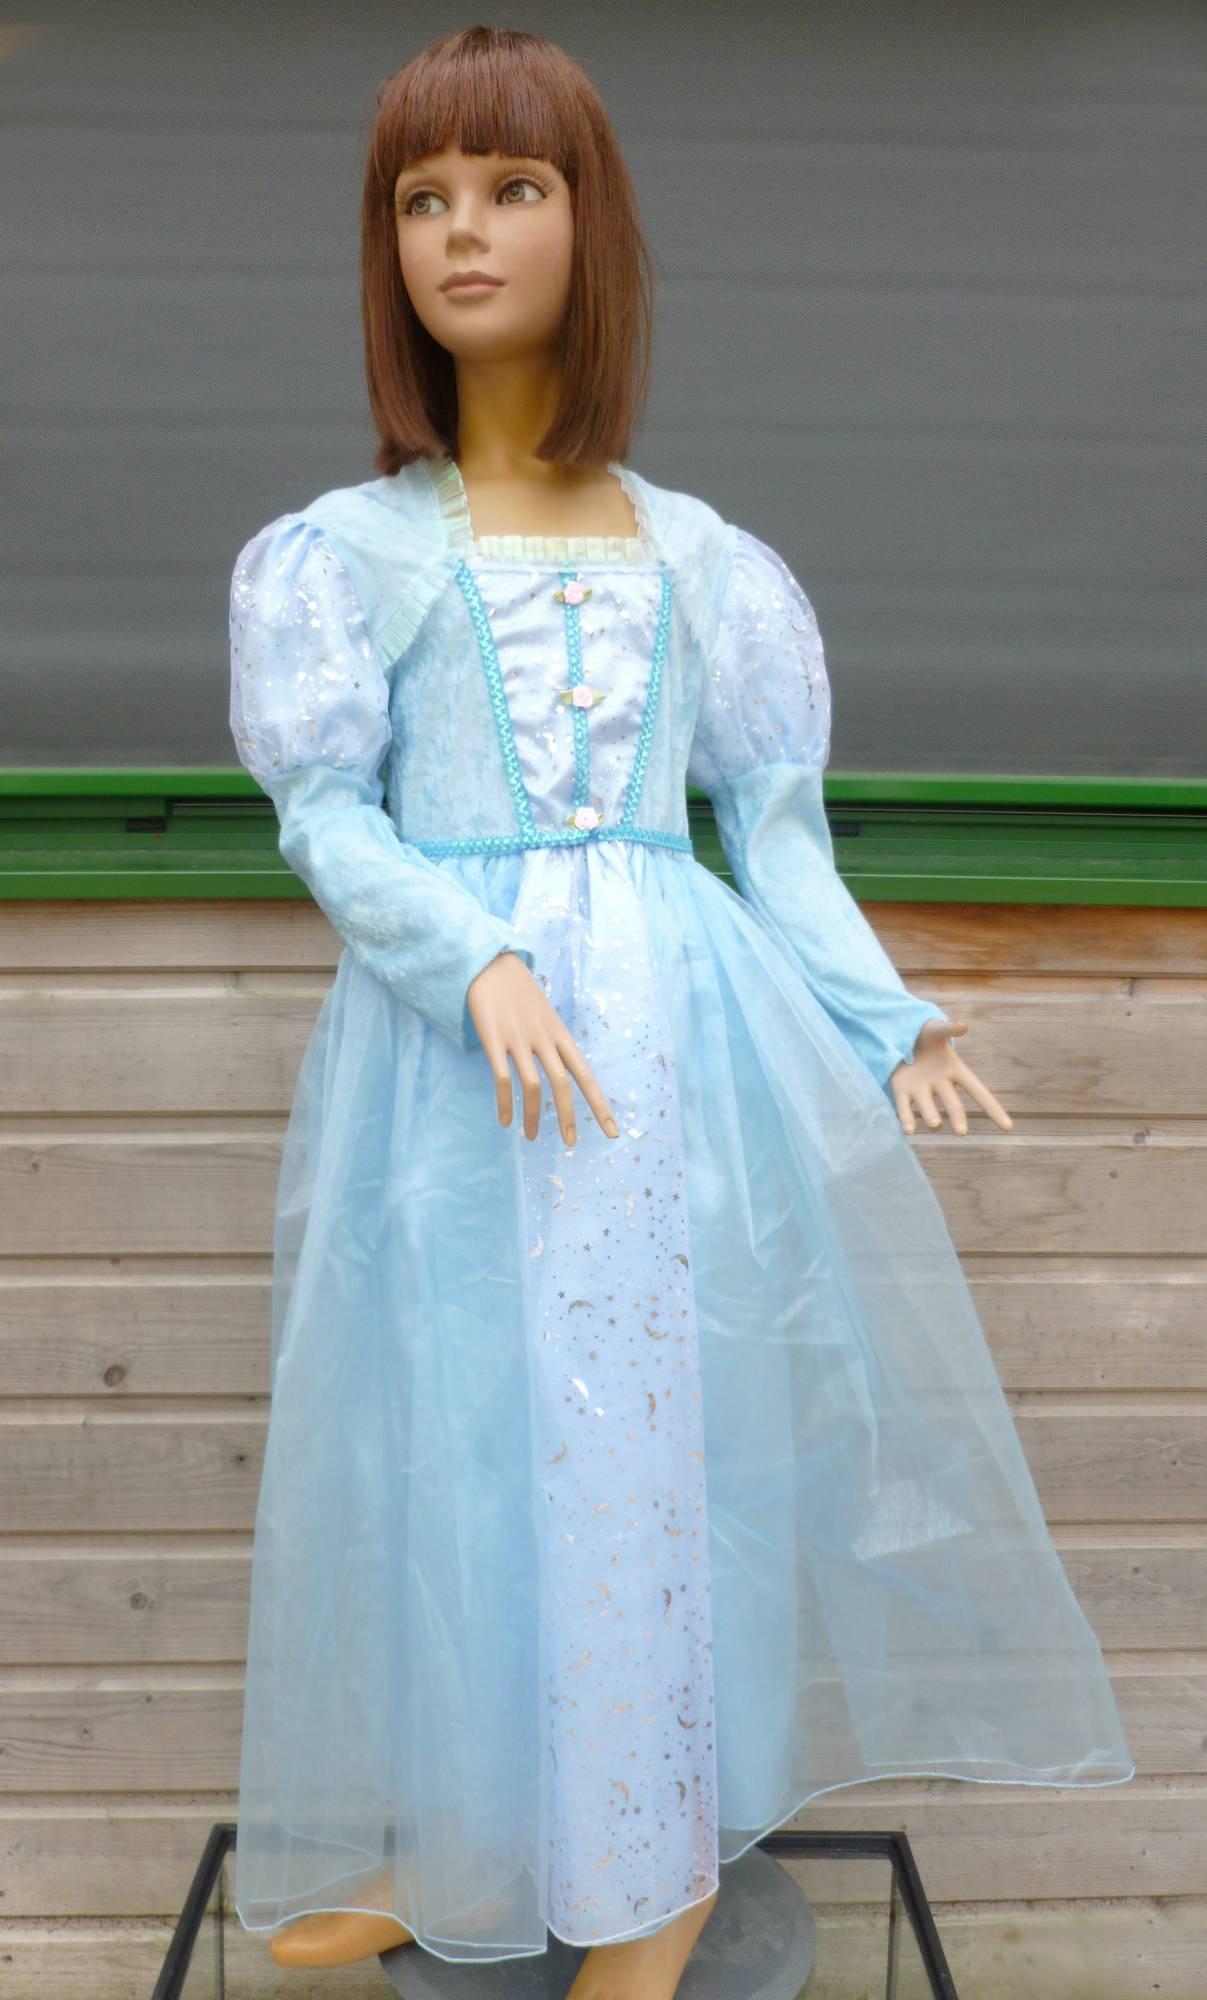 Costume-Princesse-Bleue-Fille